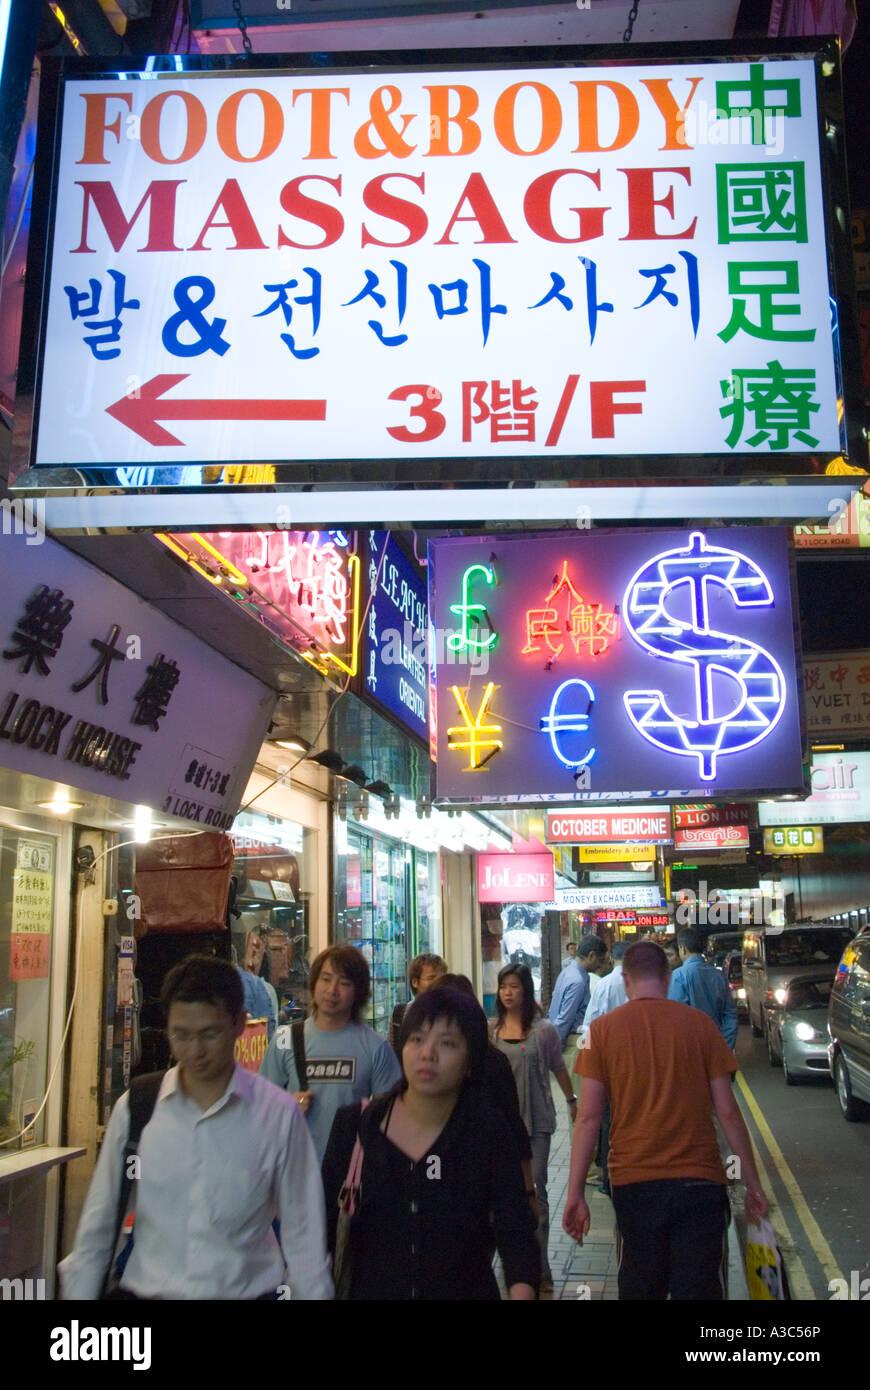 Adult Guide in Hong Kong